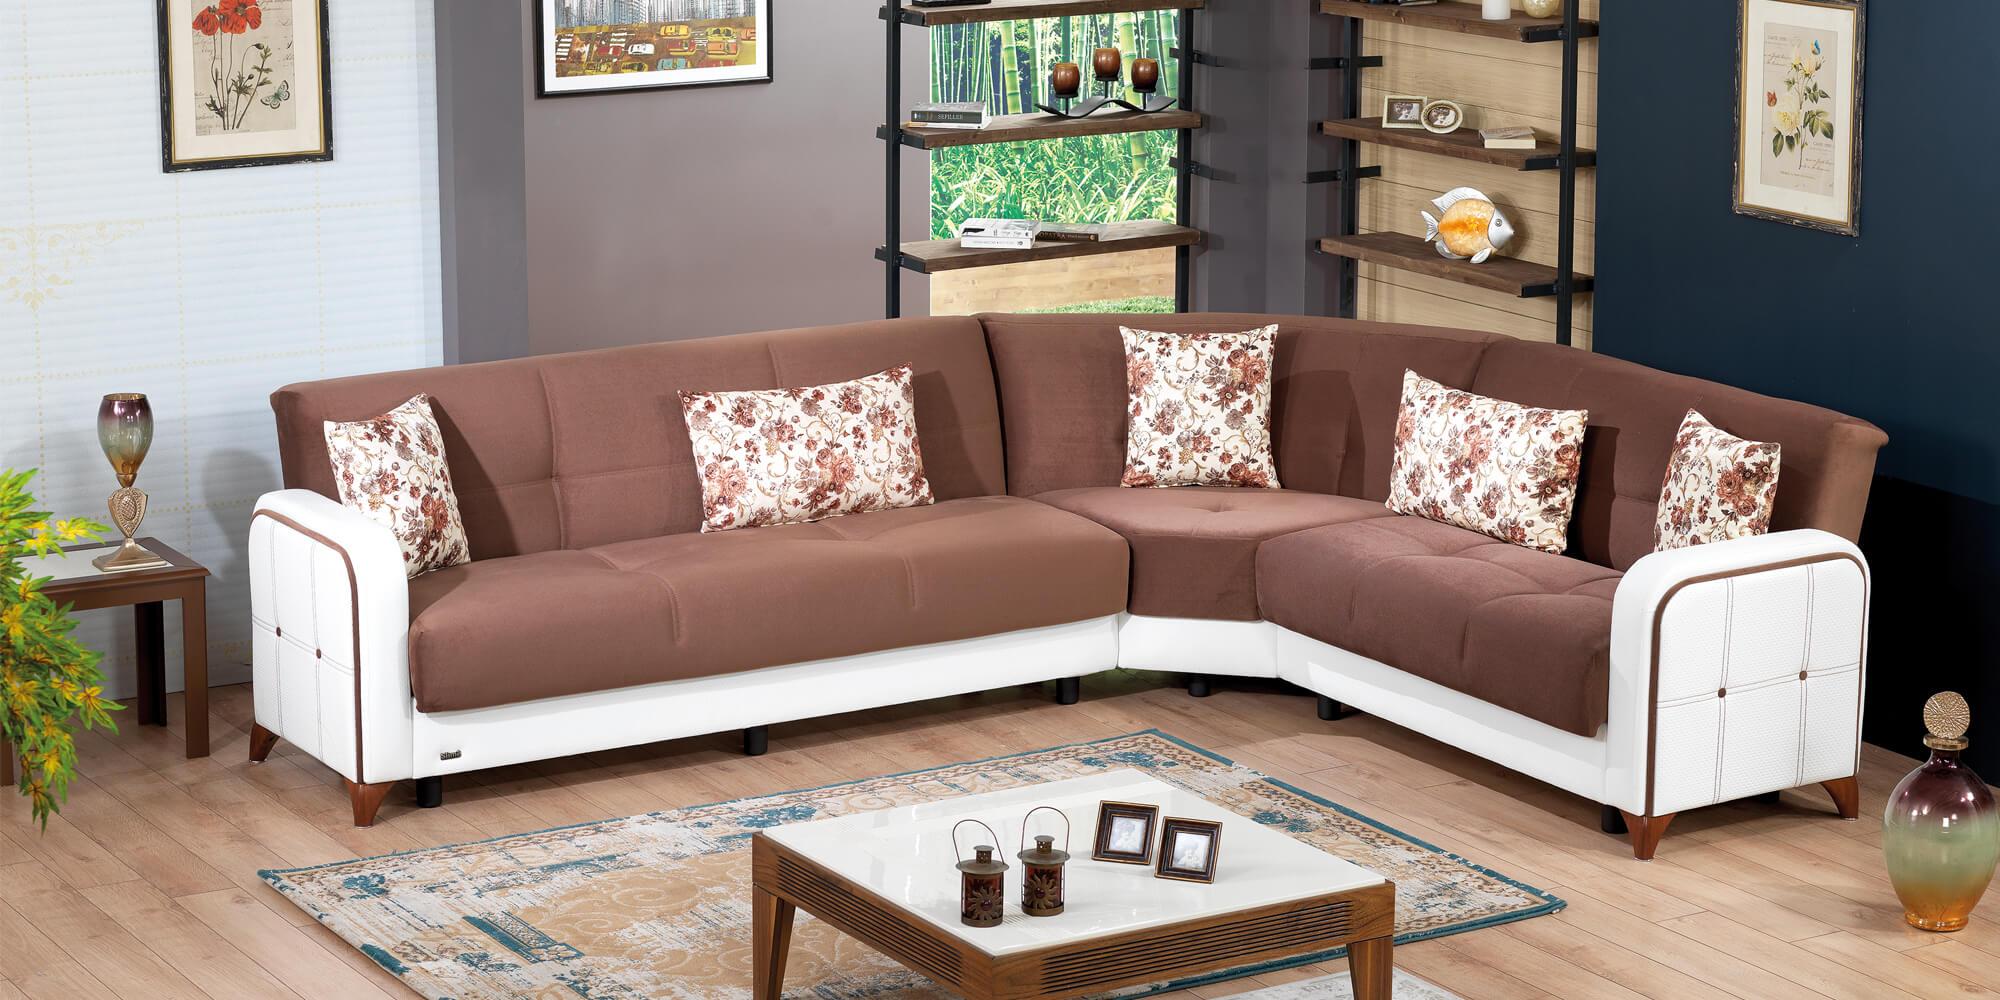 eva sitzecke yuvam m belhaus in wuppertal cilek offizieller h ndler in europa. Black Bedroom Furniture Sets. Home Design Ideas